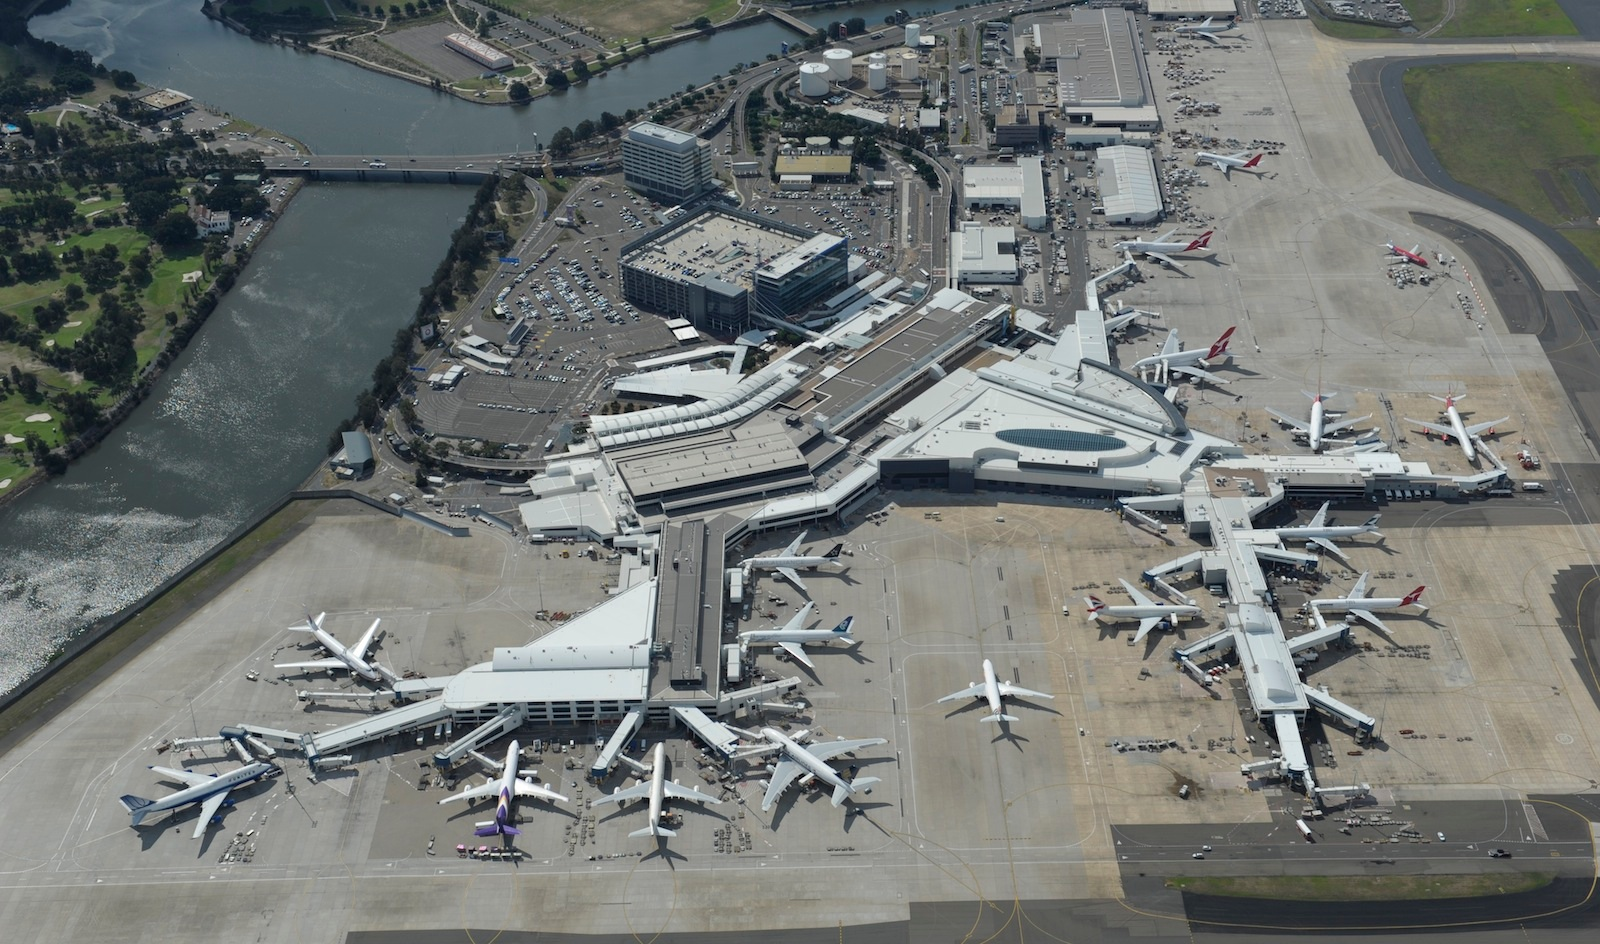 sydney airport - photo #14